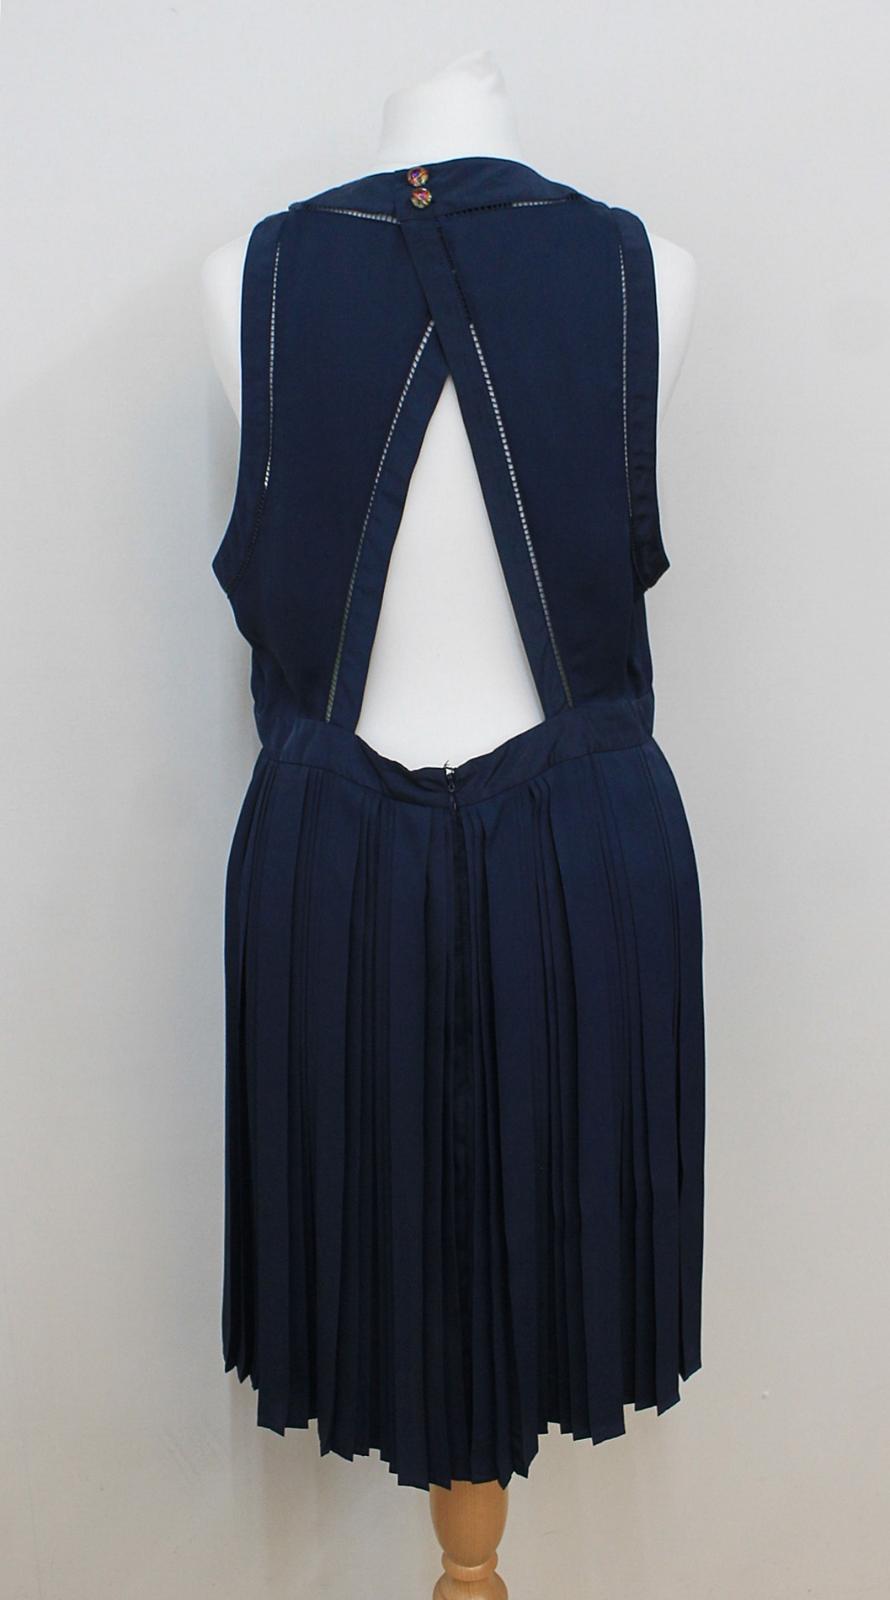 KENZO-PARIS-Ladies-Navy-Blue-Neon-Yellow-Sleeveless-Shift-Dress-FR42-UK14 thumbnail 4